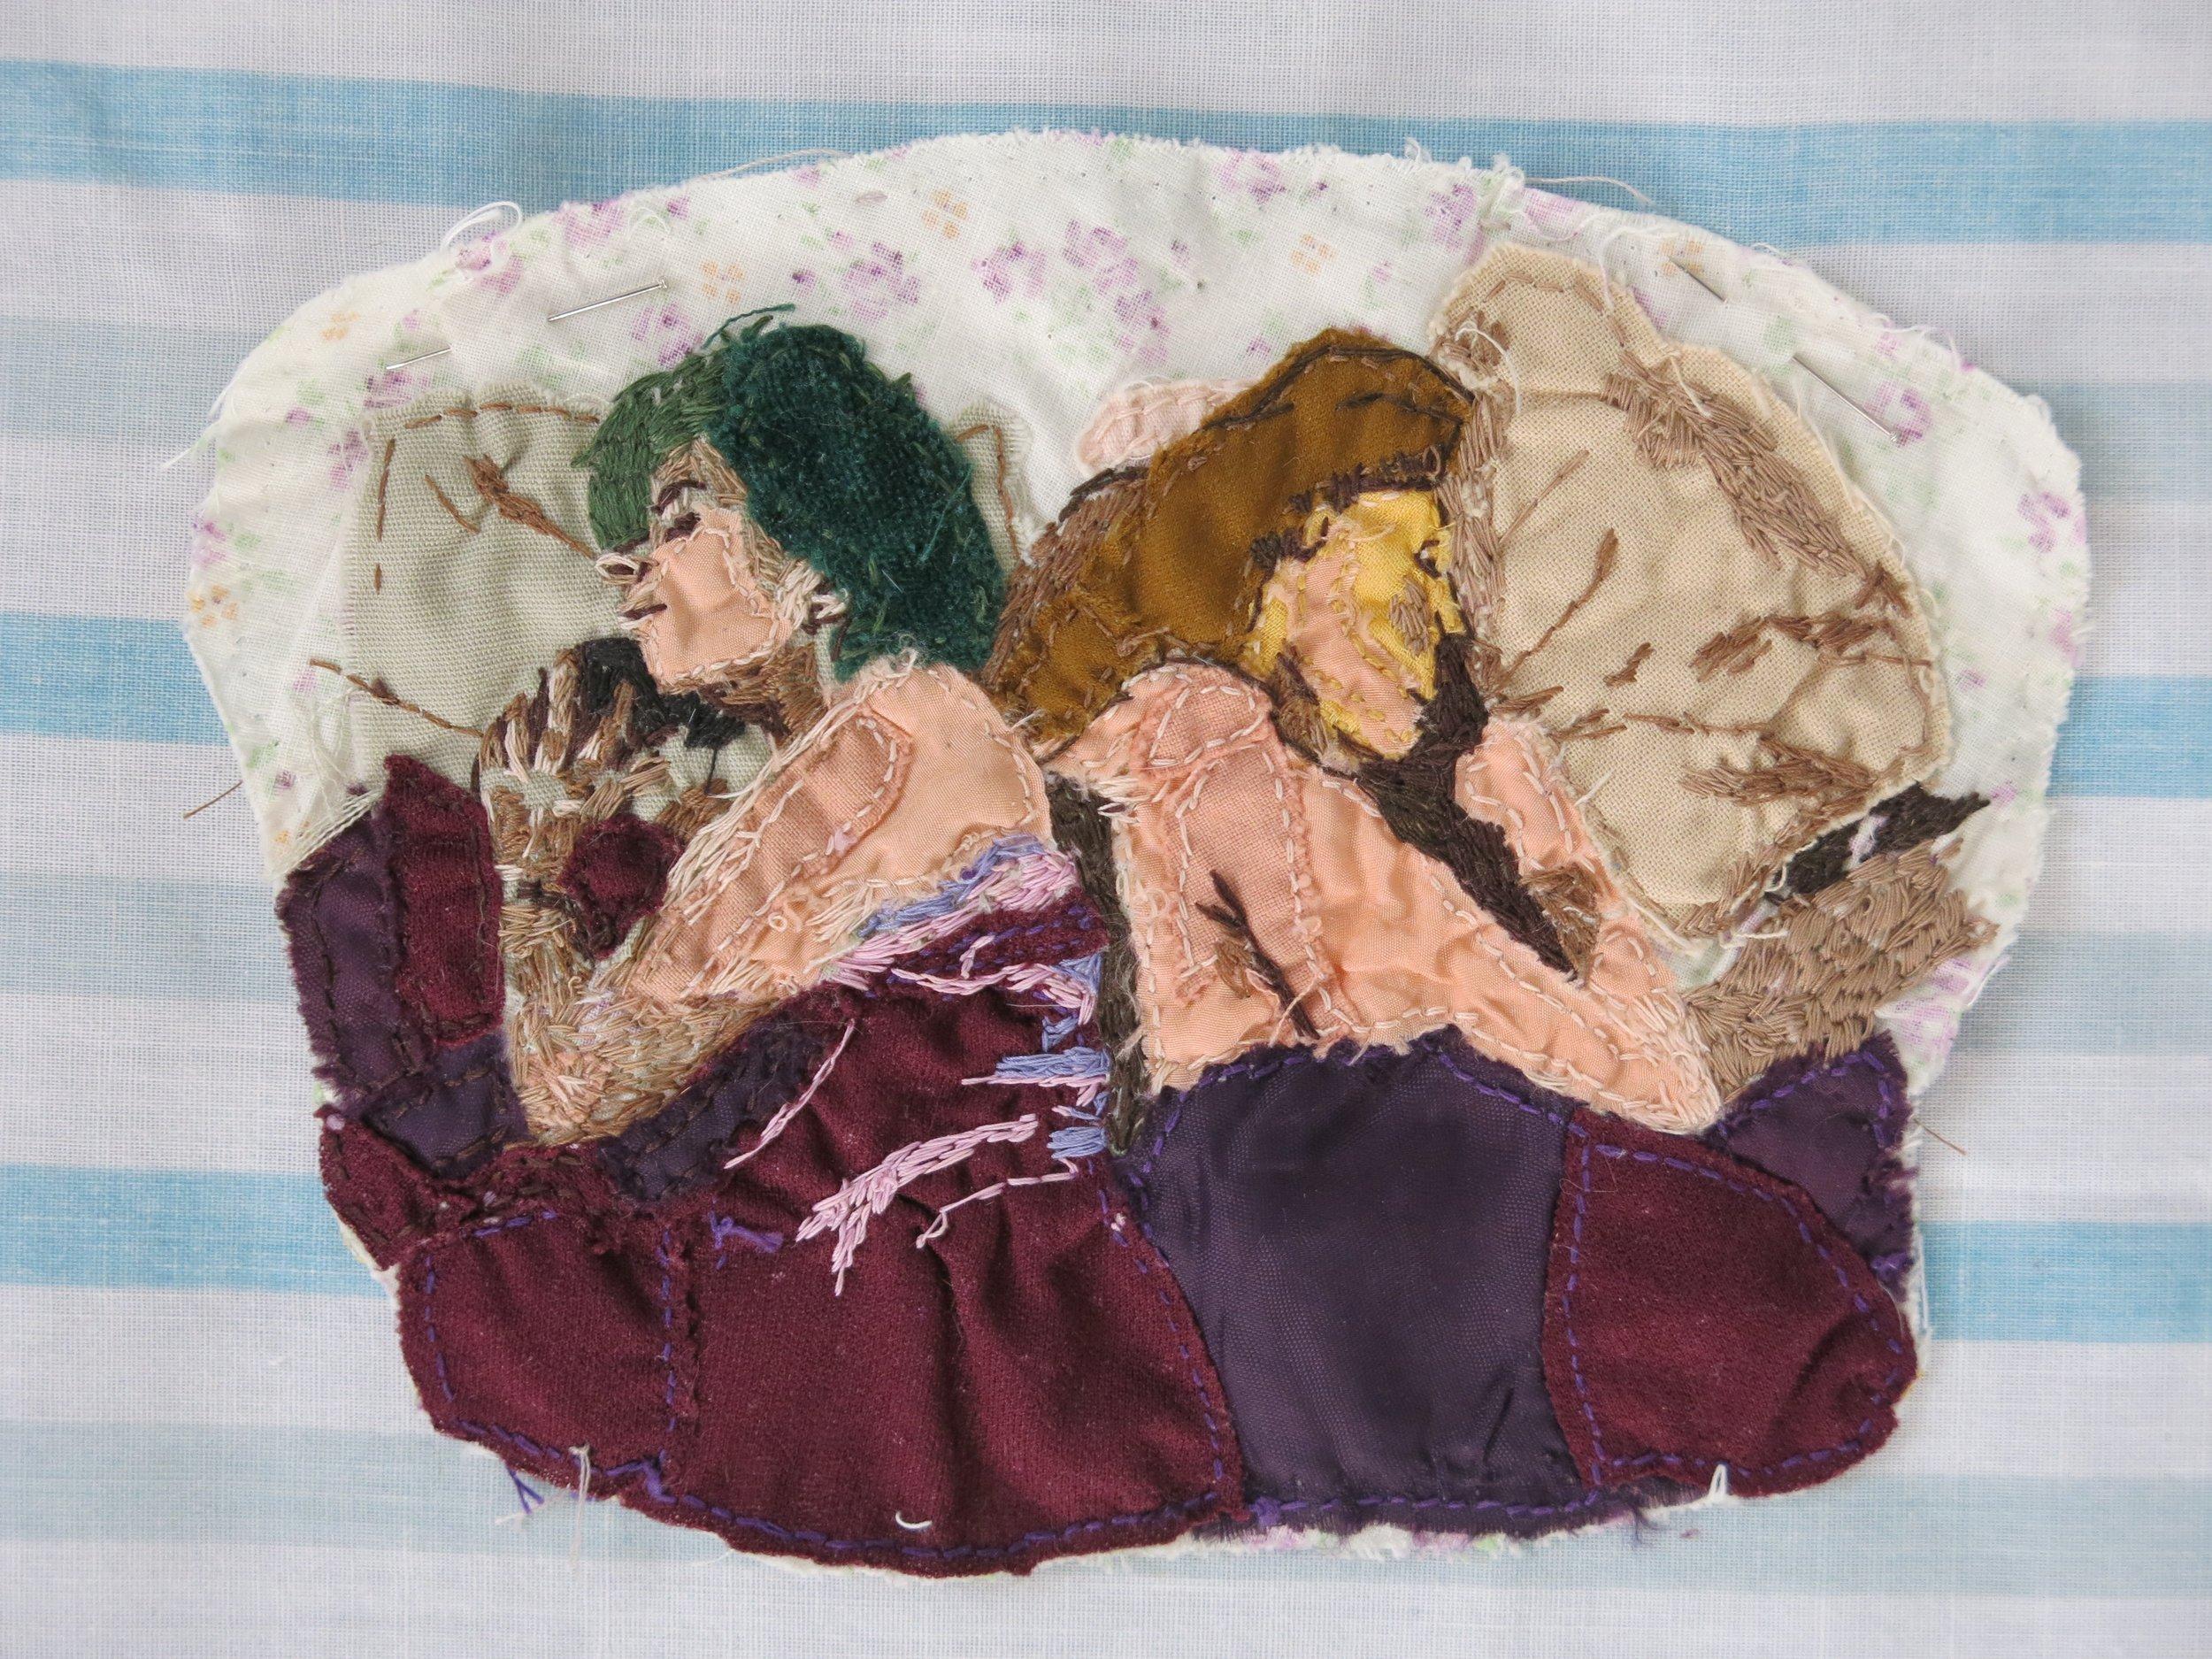 Artwork by Anne Mailey